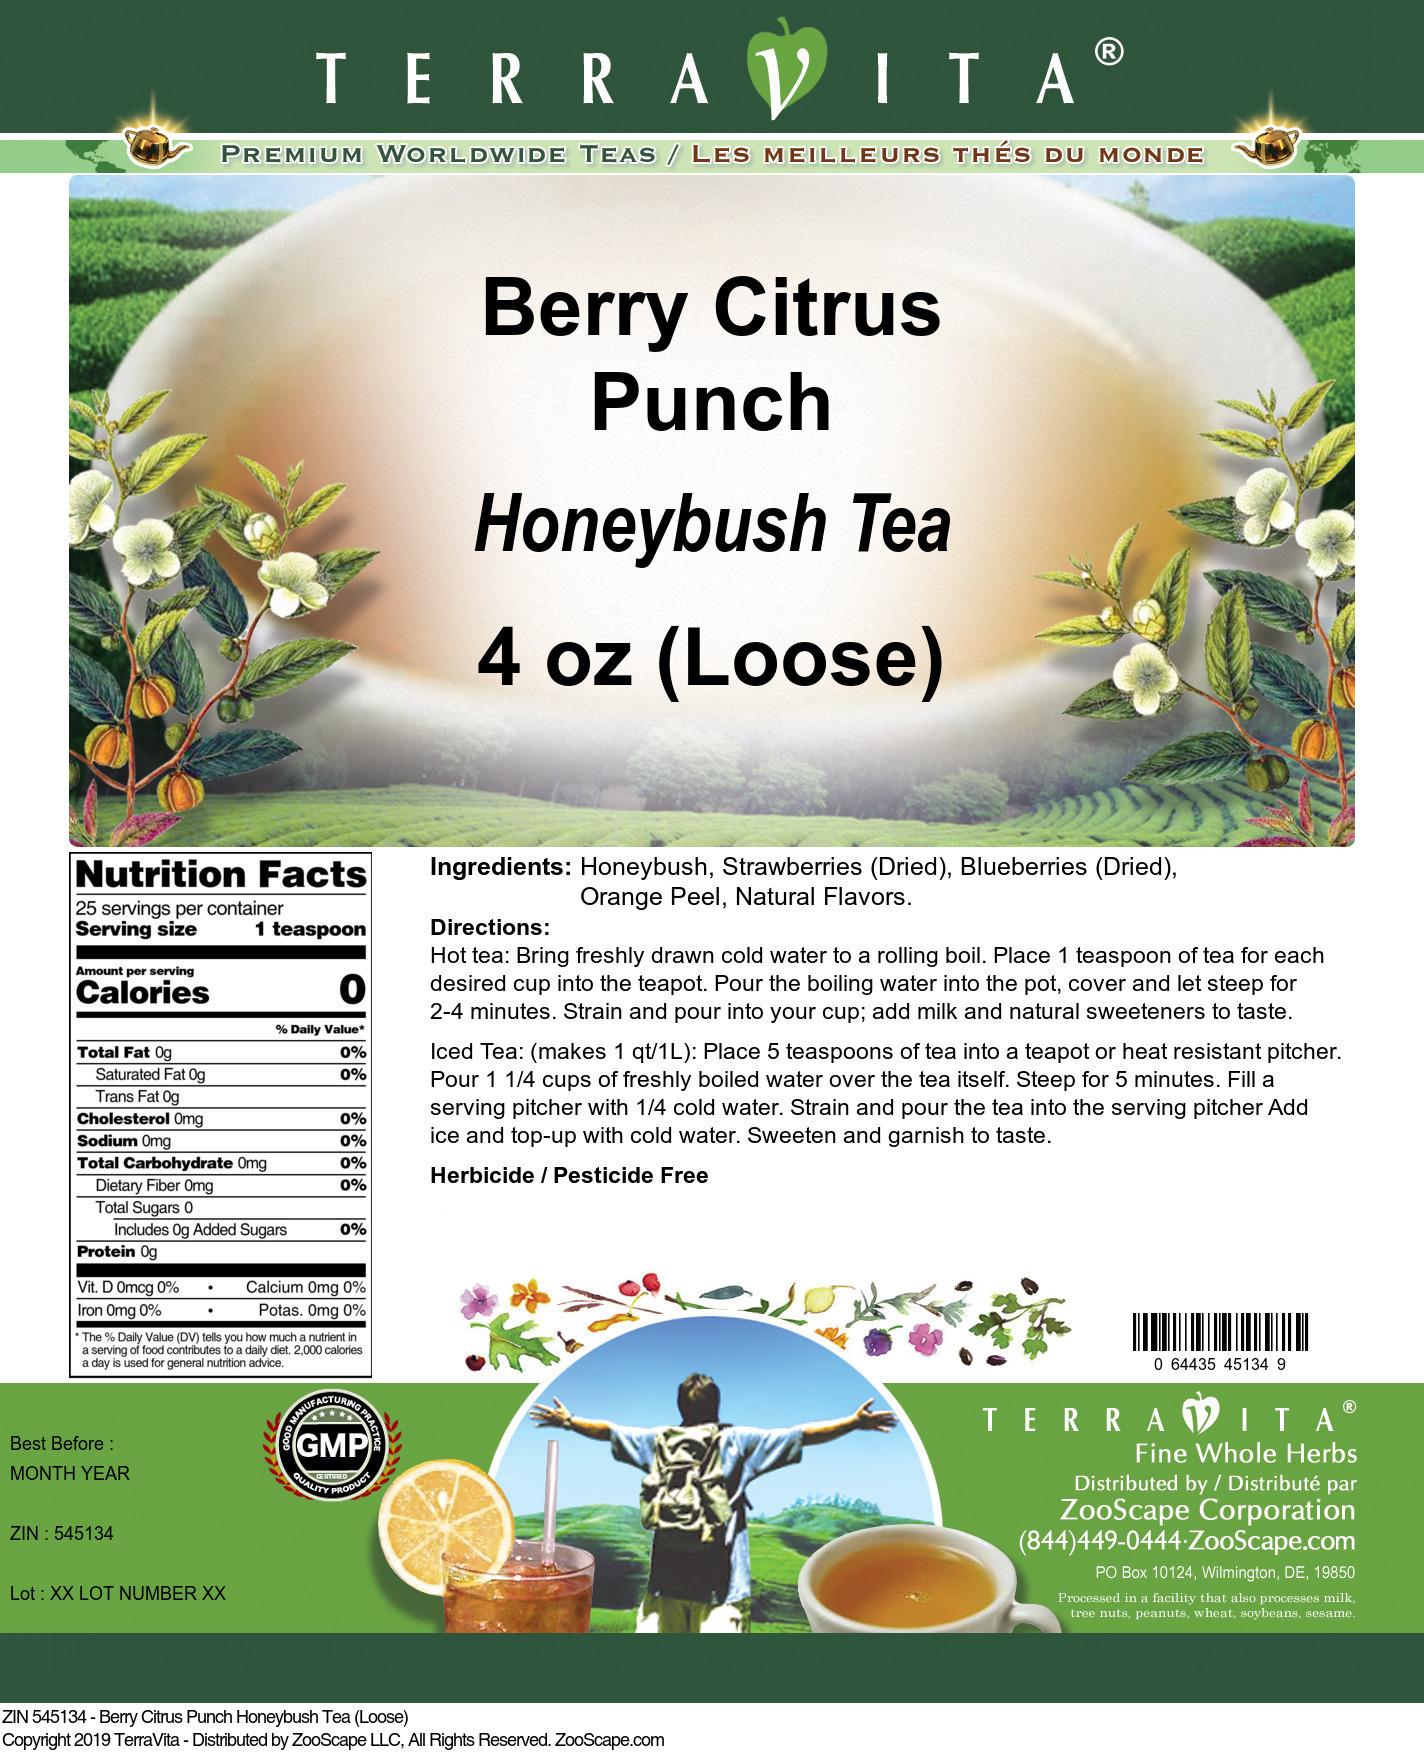 Berry Citrus Punch Honeybush Tea (Loose)